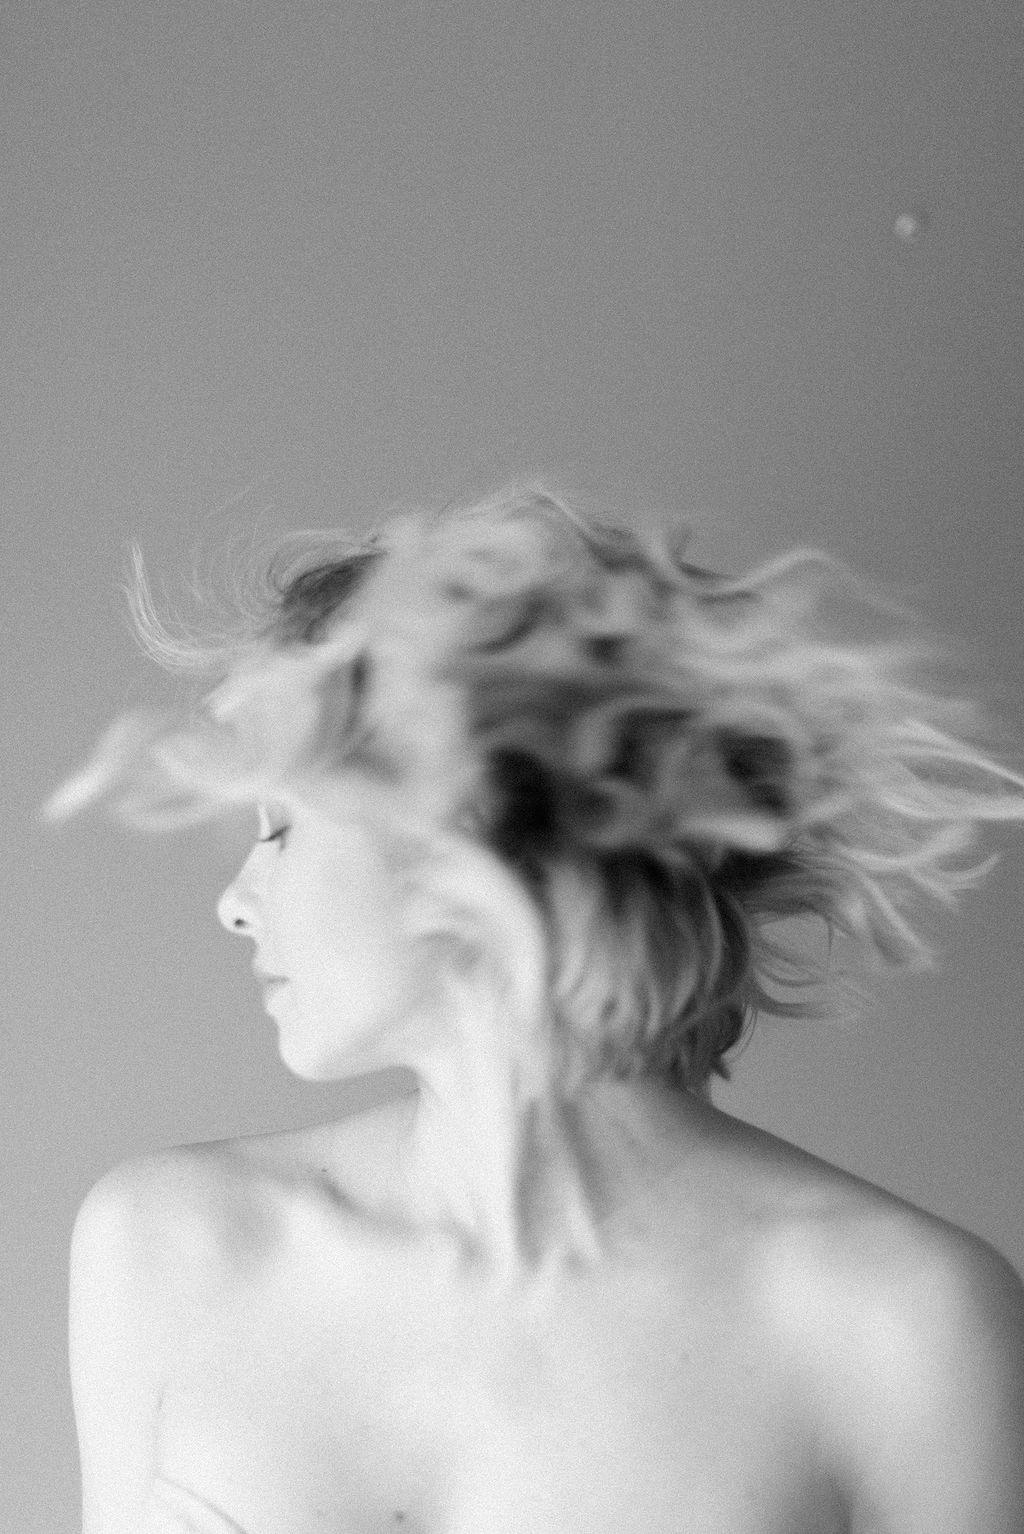 FashioneditorialSabben-Bo&luca-EmmanuelleMarty-webPhotography-13